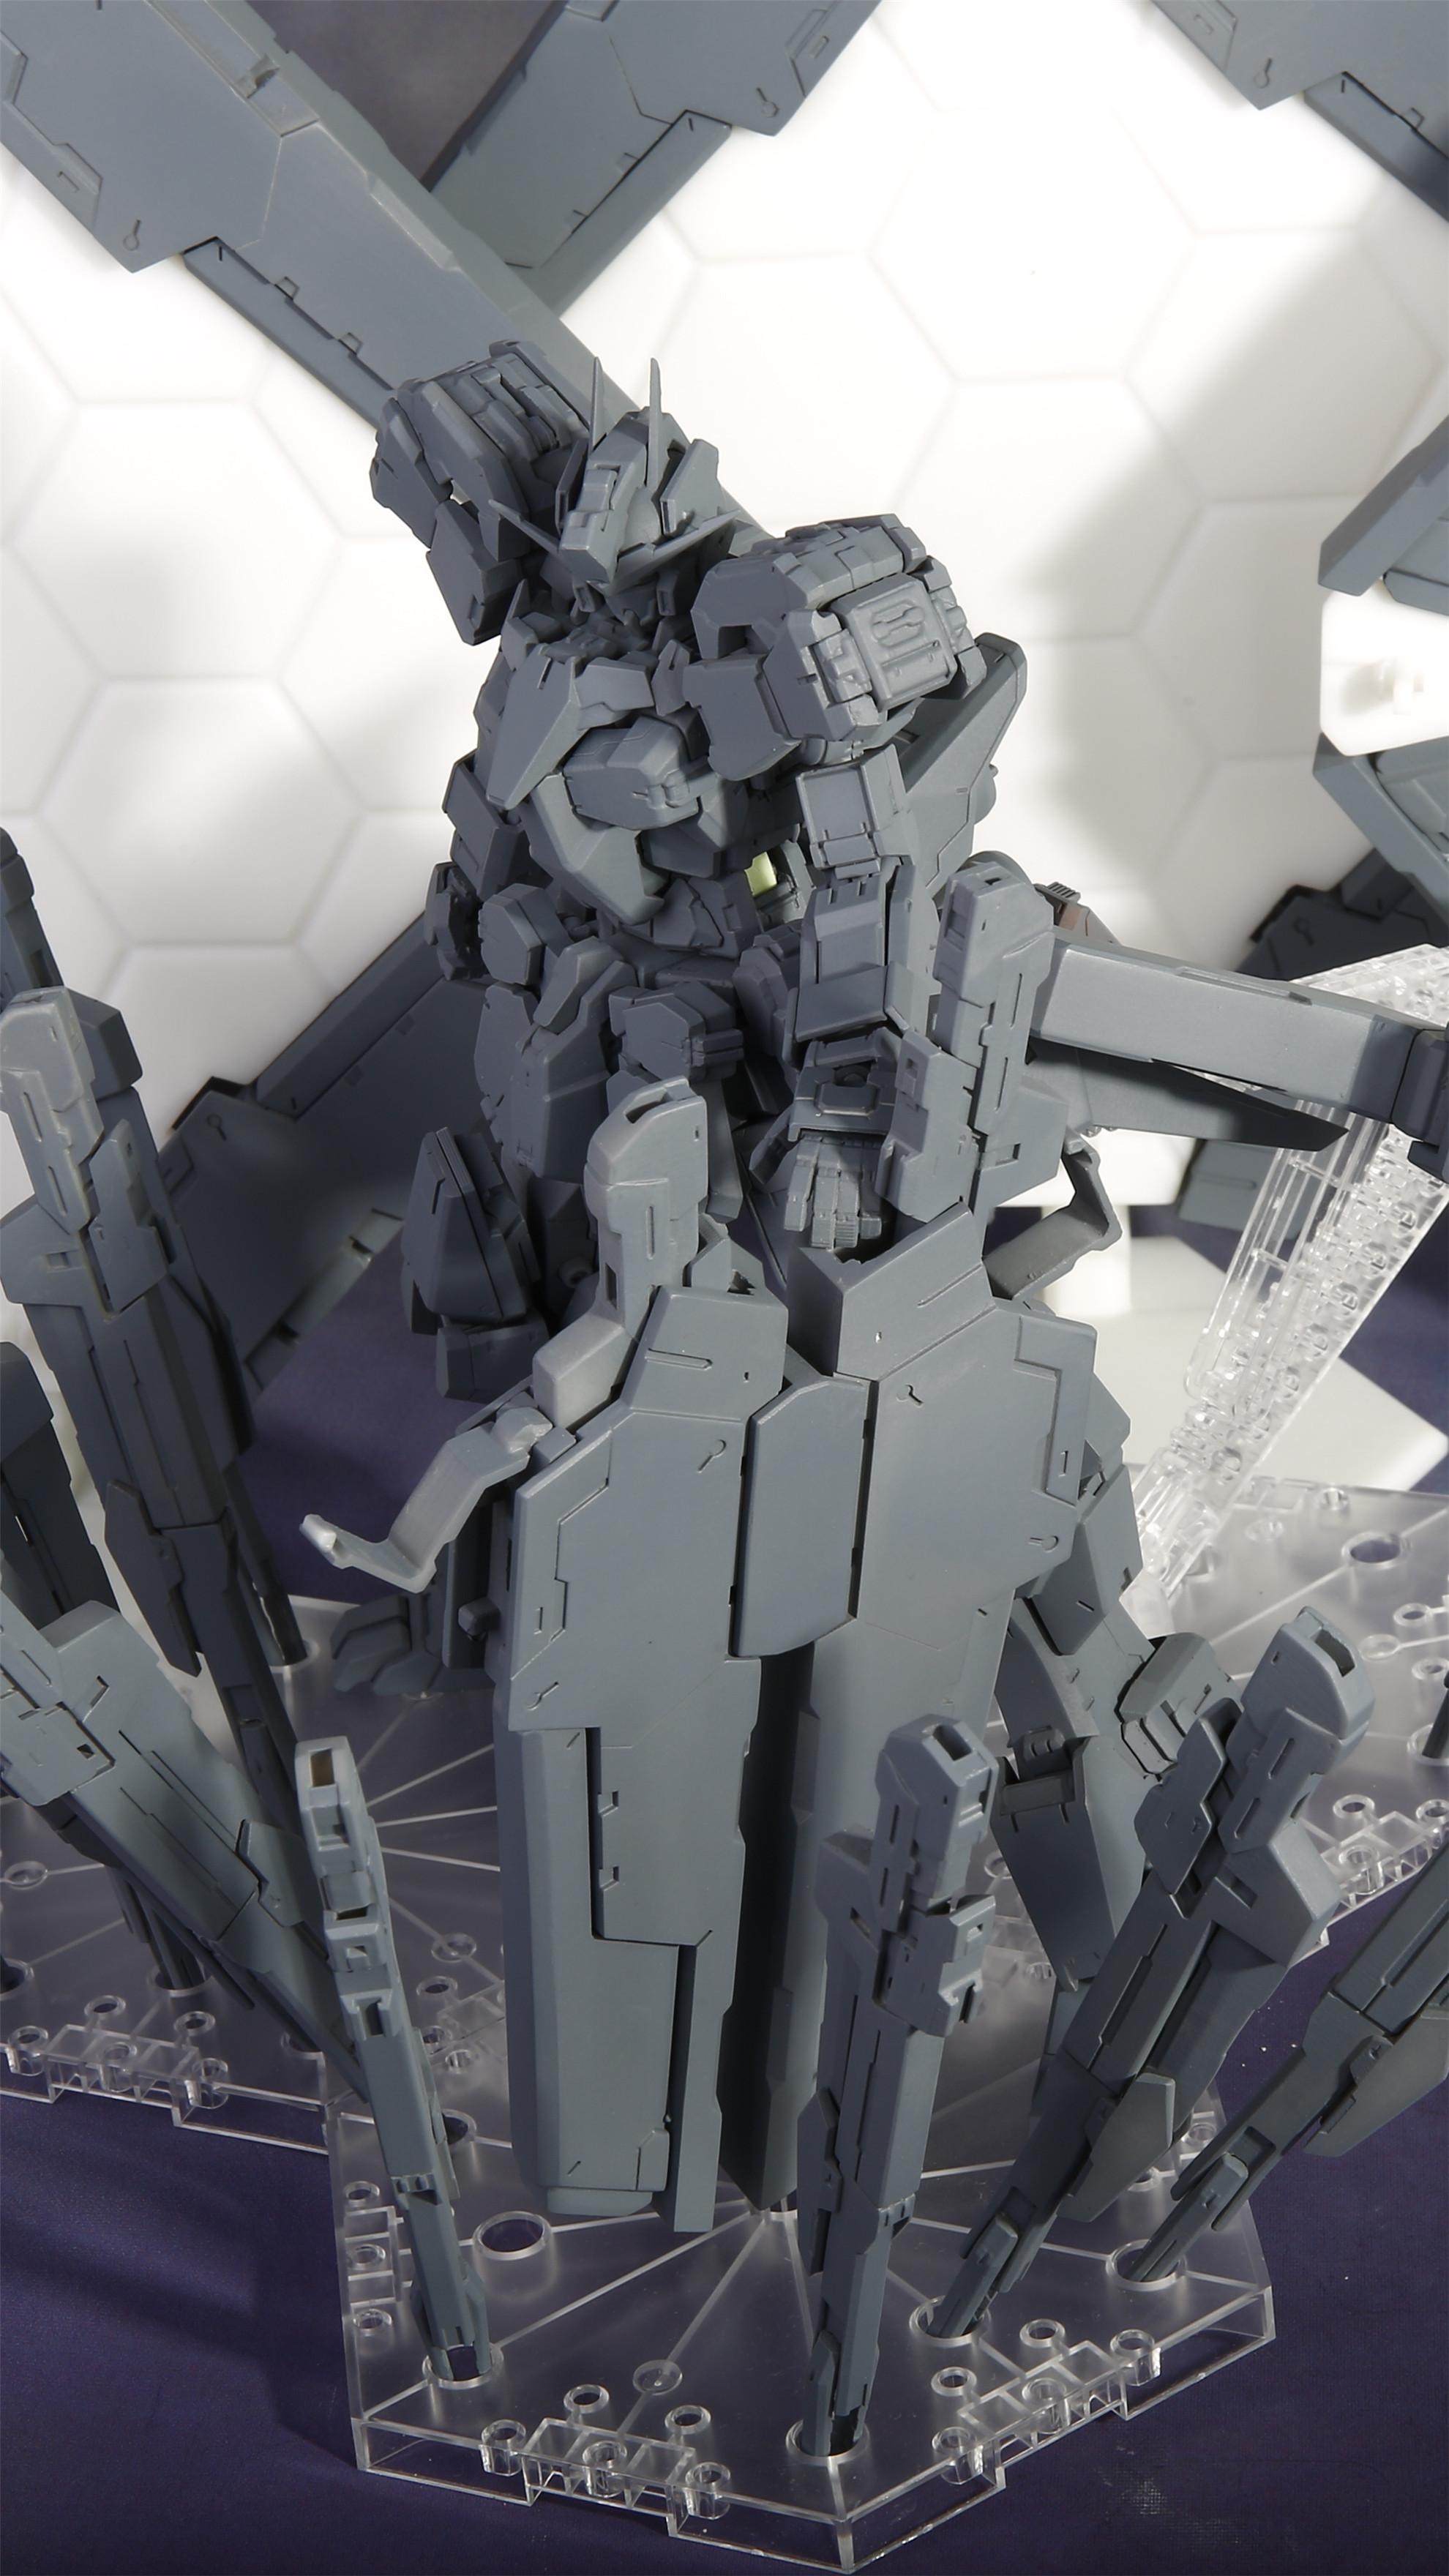 G652_Gundam_Zabanya_005.jpg